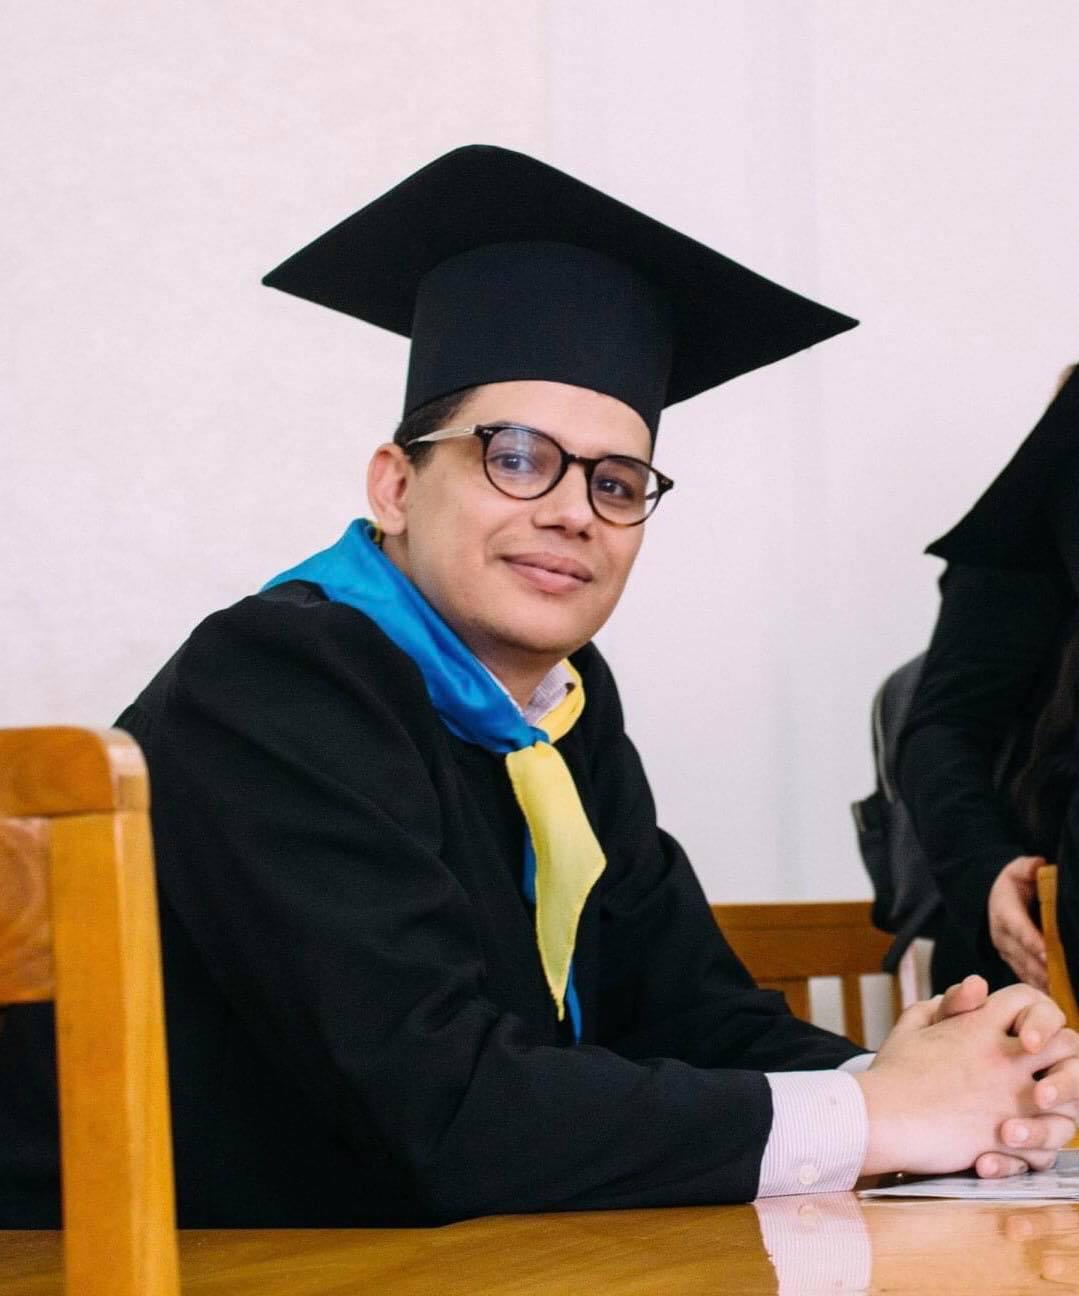 Lakehal Mohamed El Amine